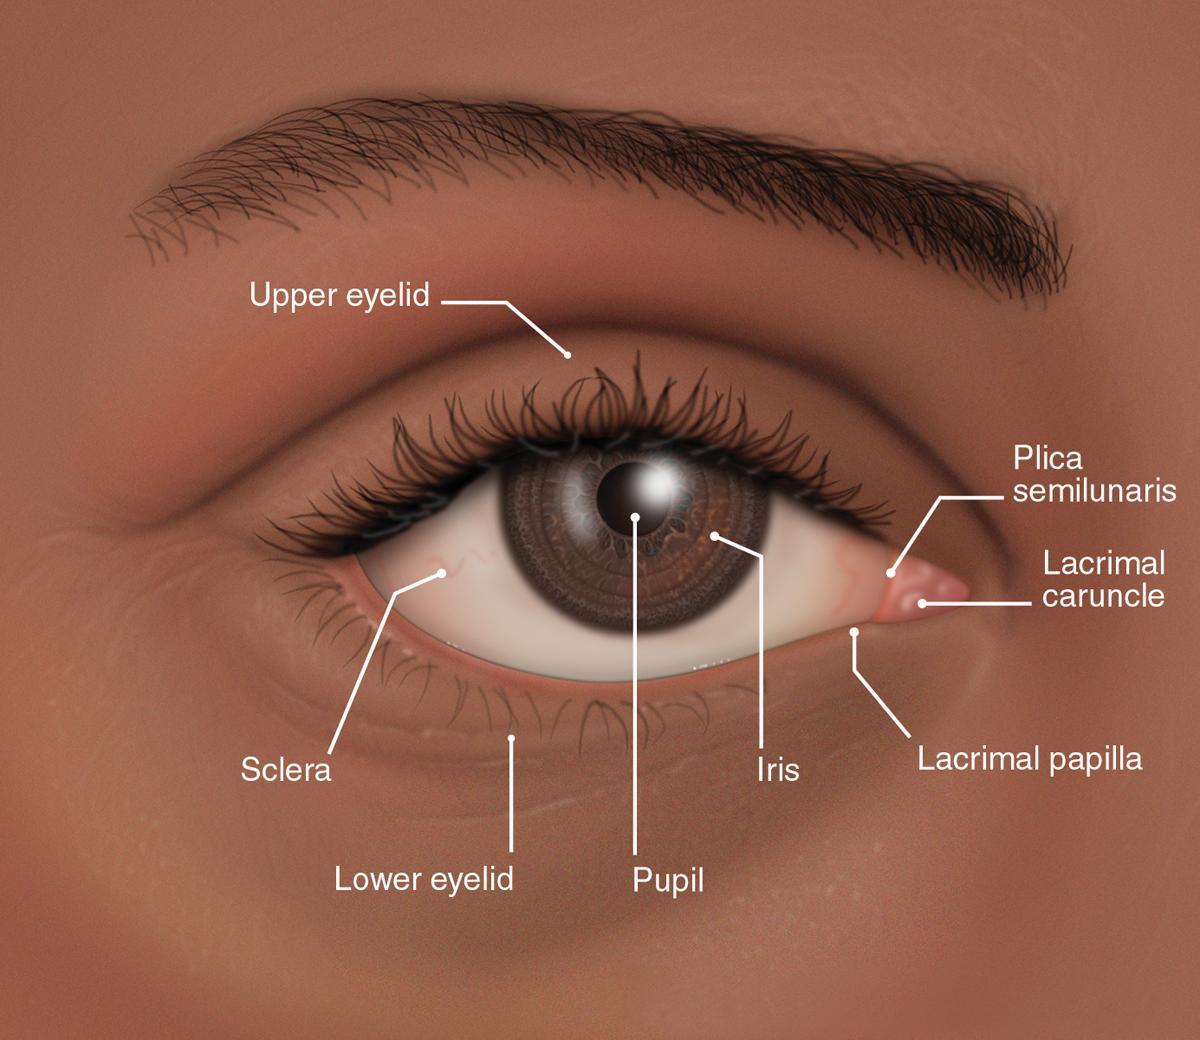 plica semilunaris swollen eye allergies - HD1200×1040